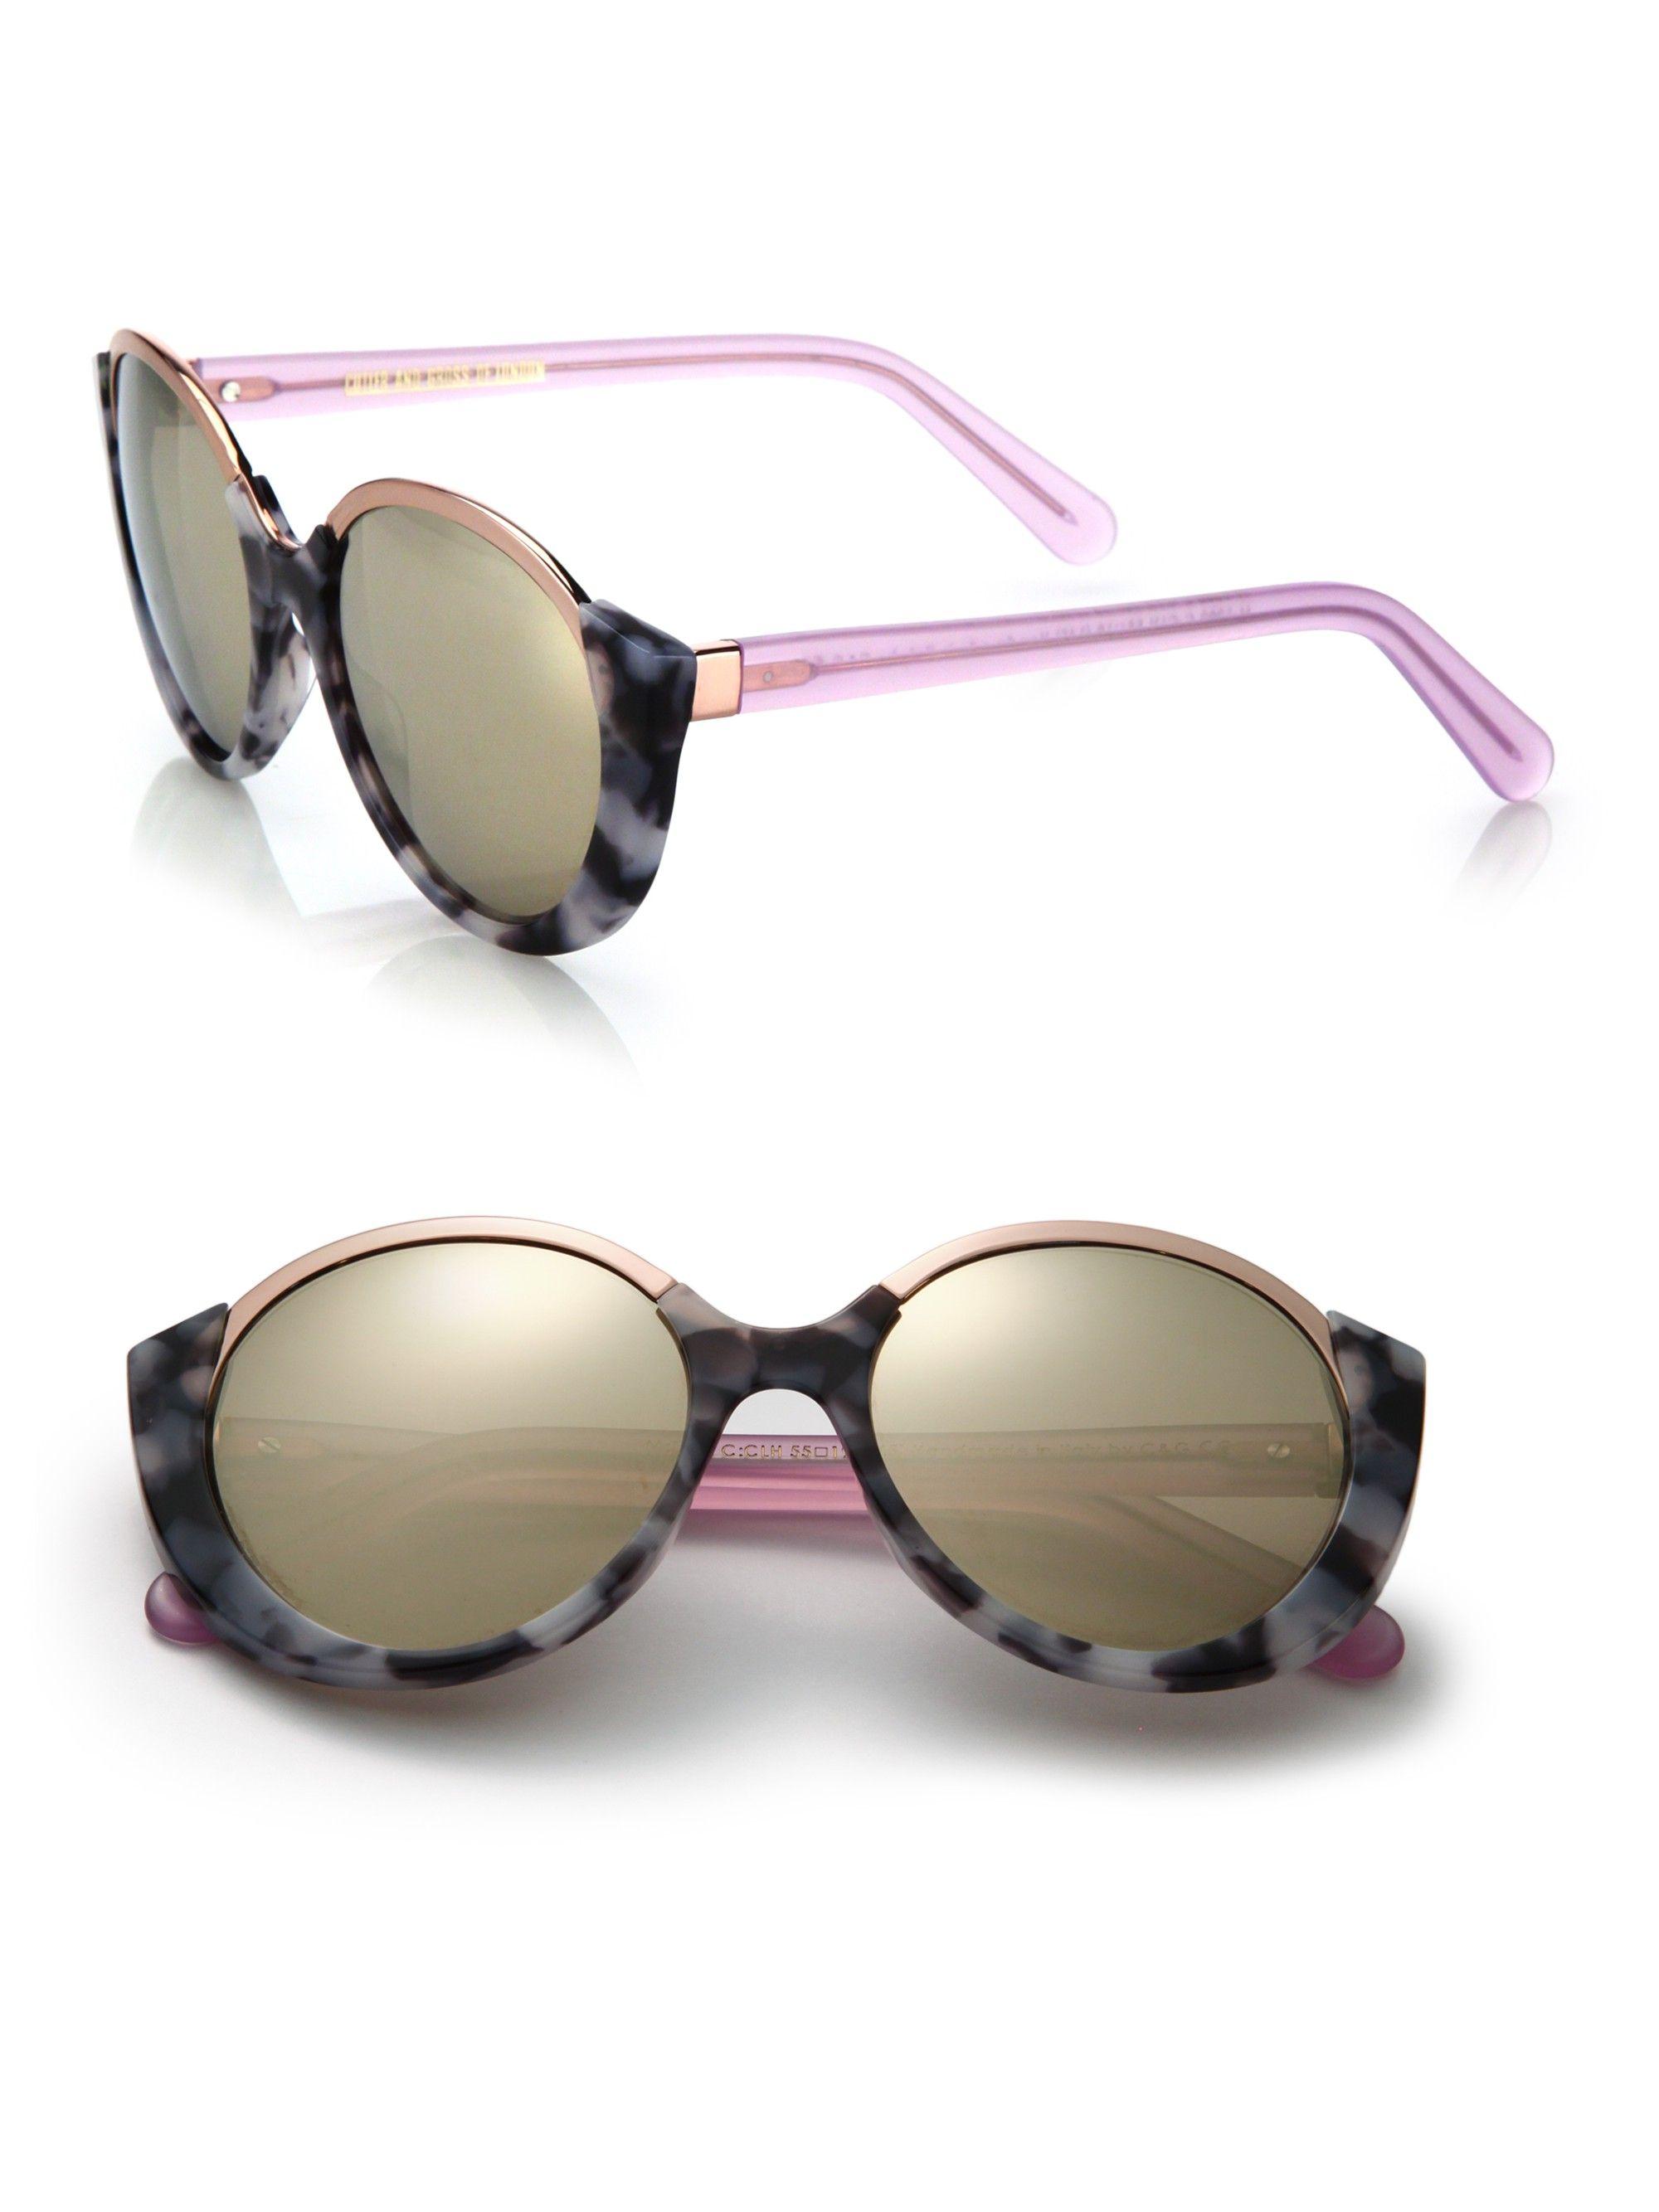 1e75e4a1bb Cutler And Gross 1202 Mai Tai 55Mm Acetate   Metal Sunglasses - Cloudy  Havana One Size